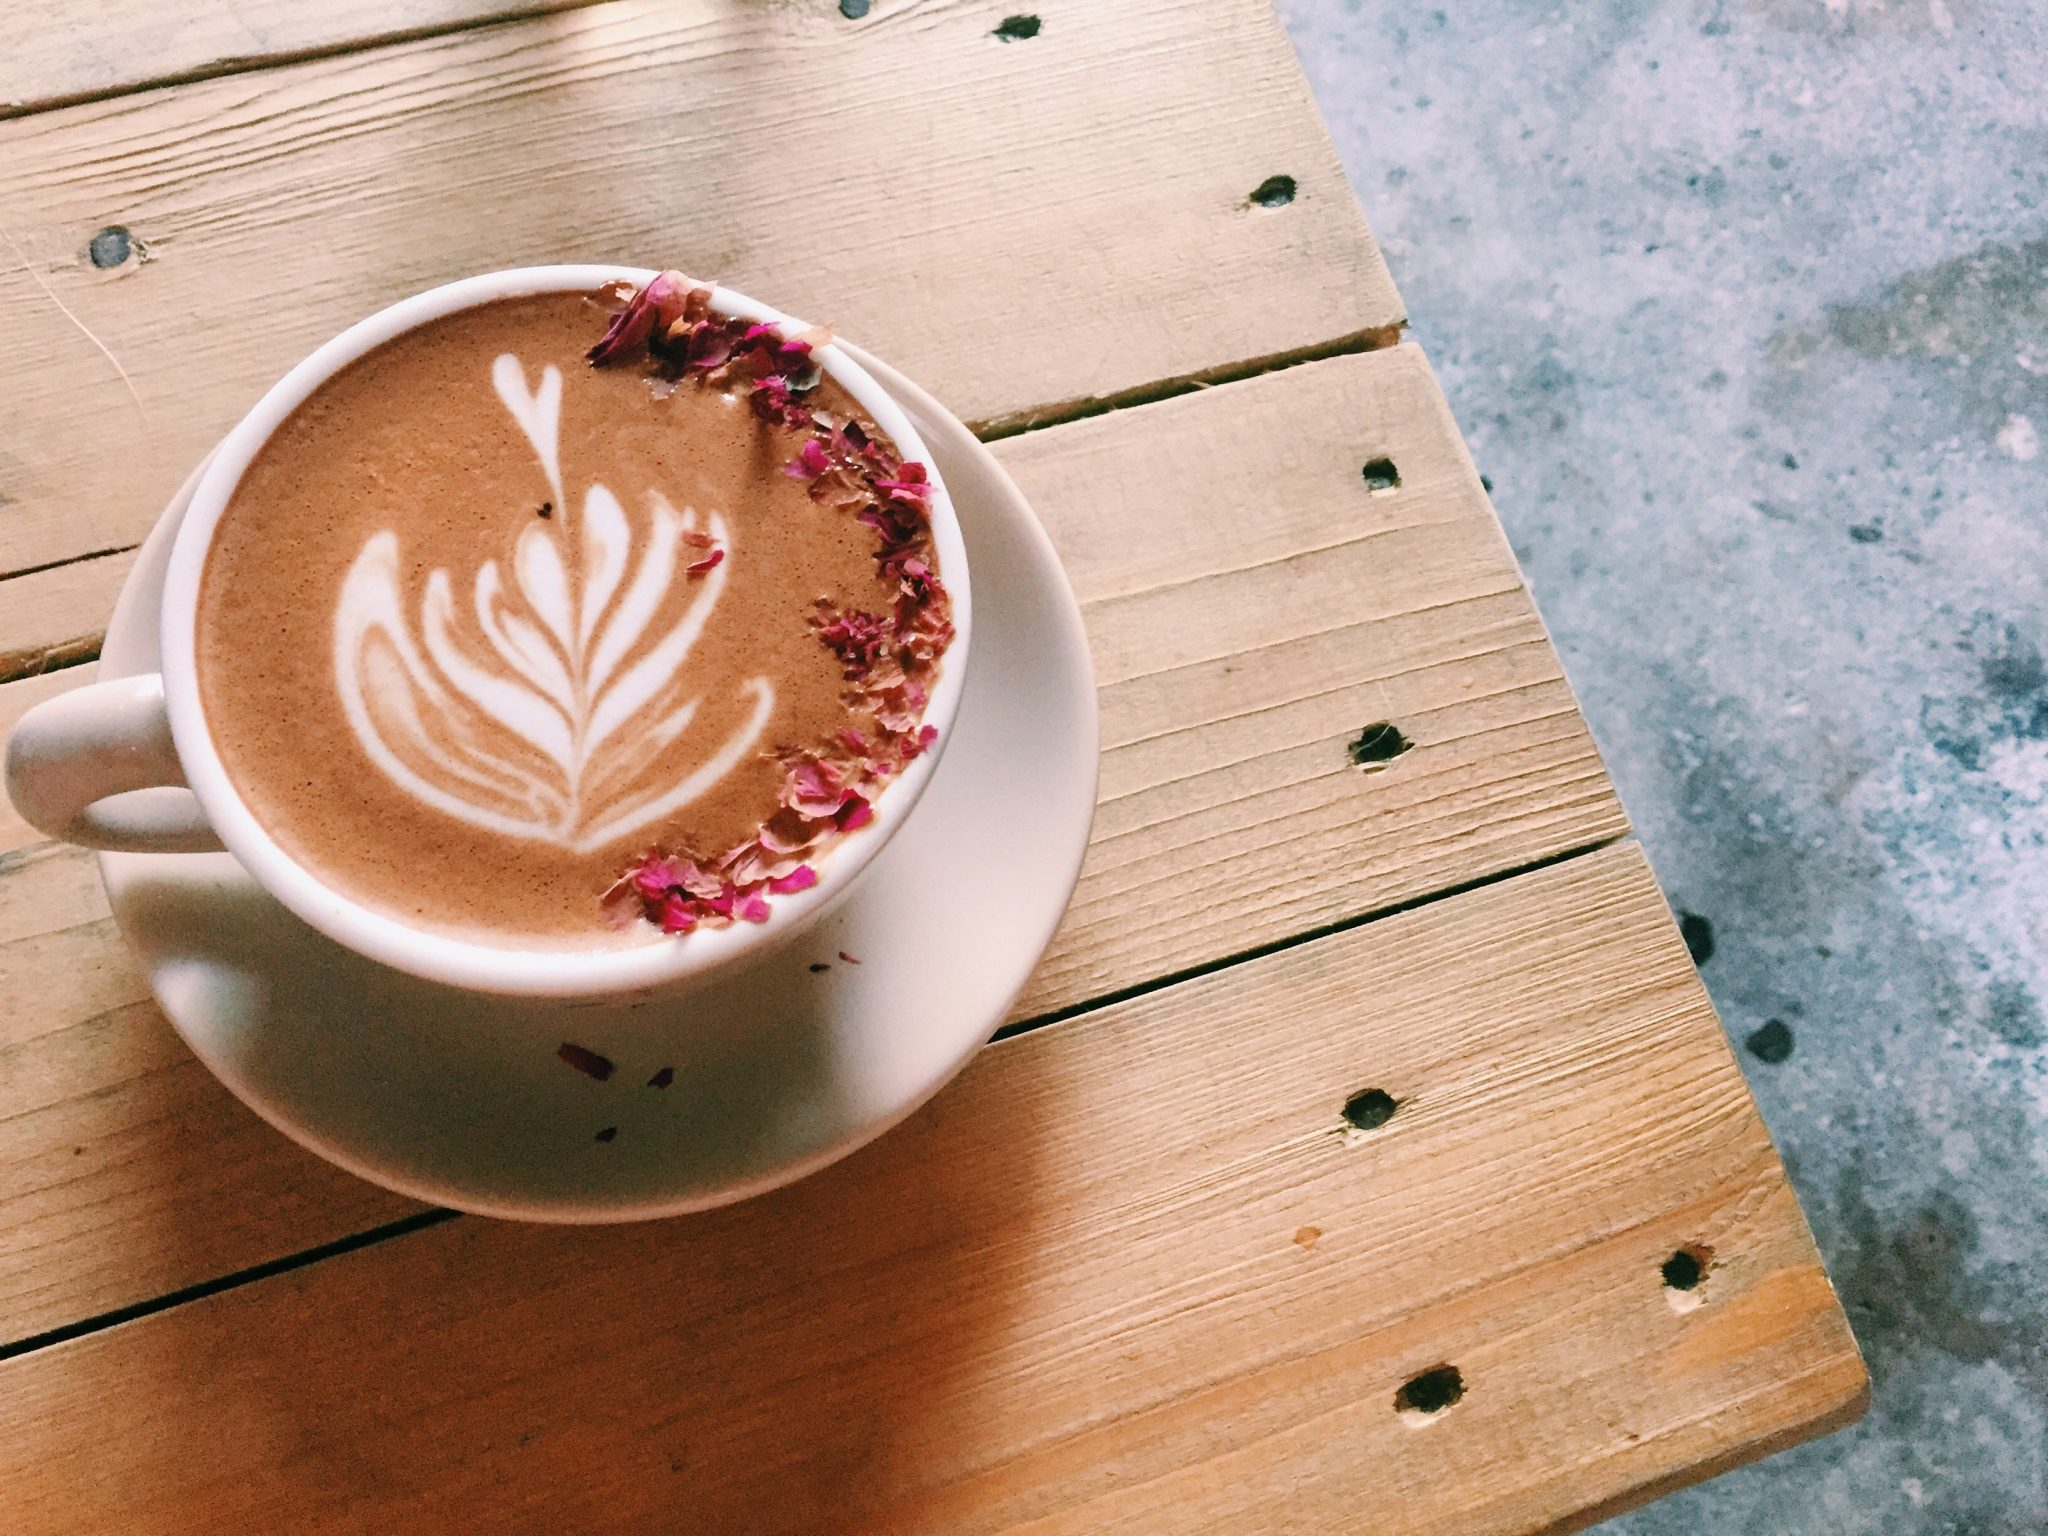 Rose mocha at Beansprout Cafe - Penang, Malaysia | Asia Travel